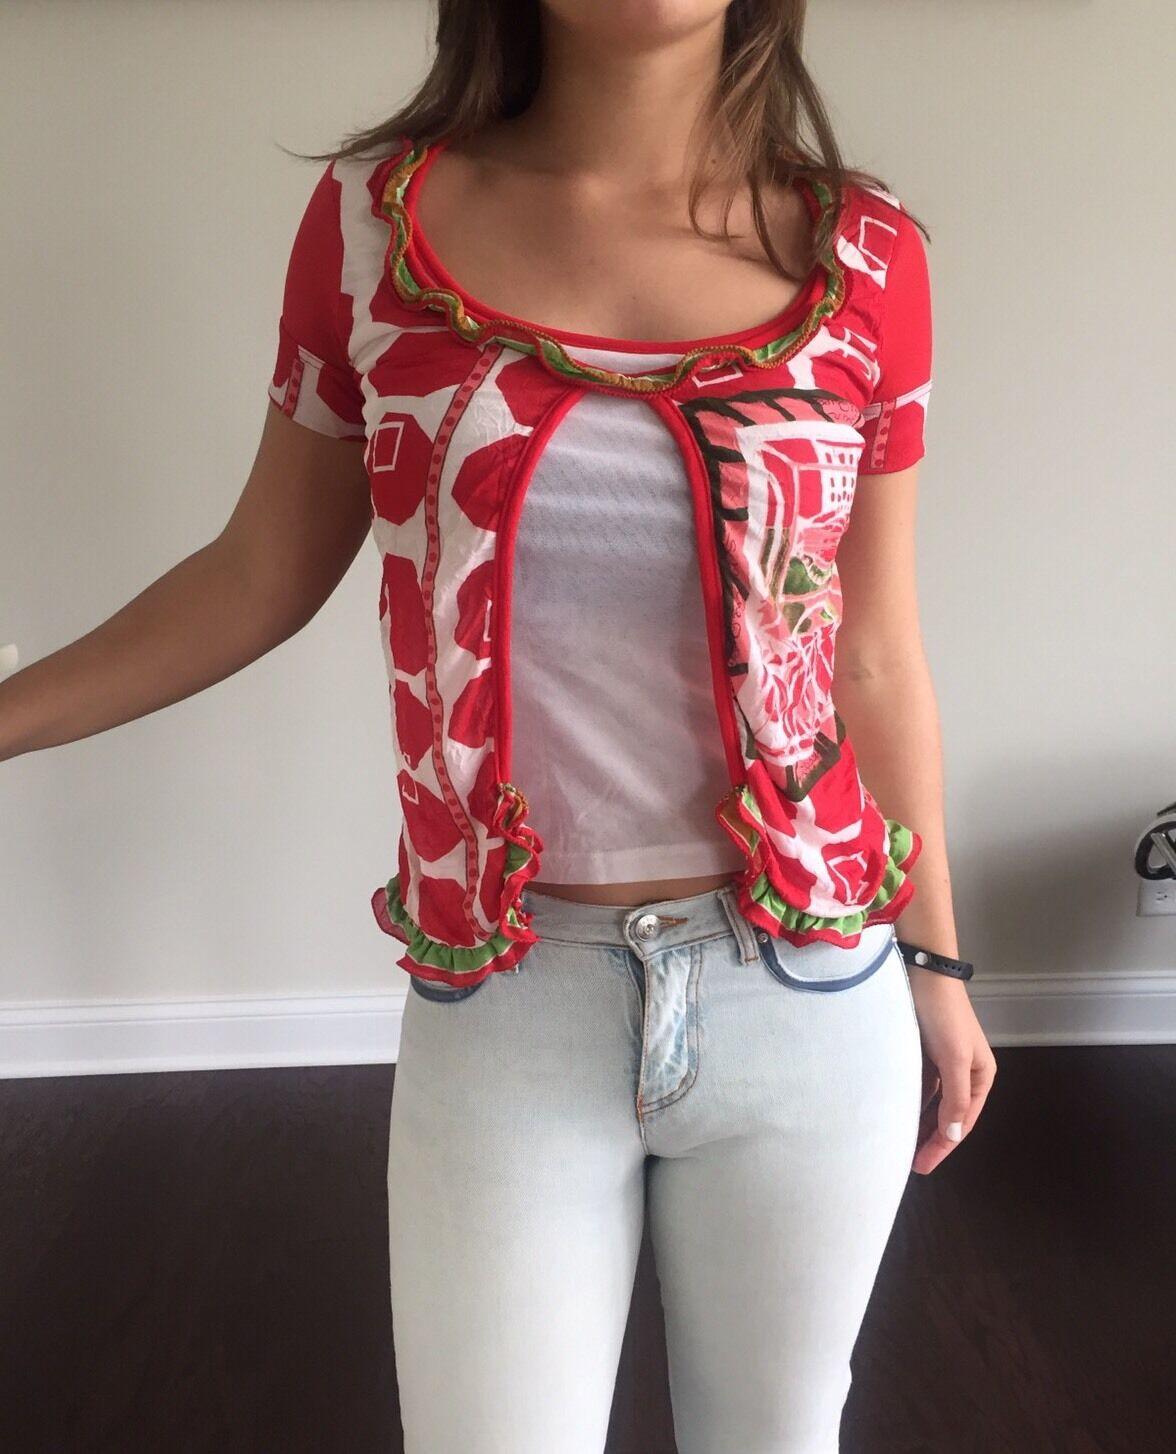 Save The Queen Woherren Top Blouse Short Sleeve MulticolGoldt Polyester Größe S